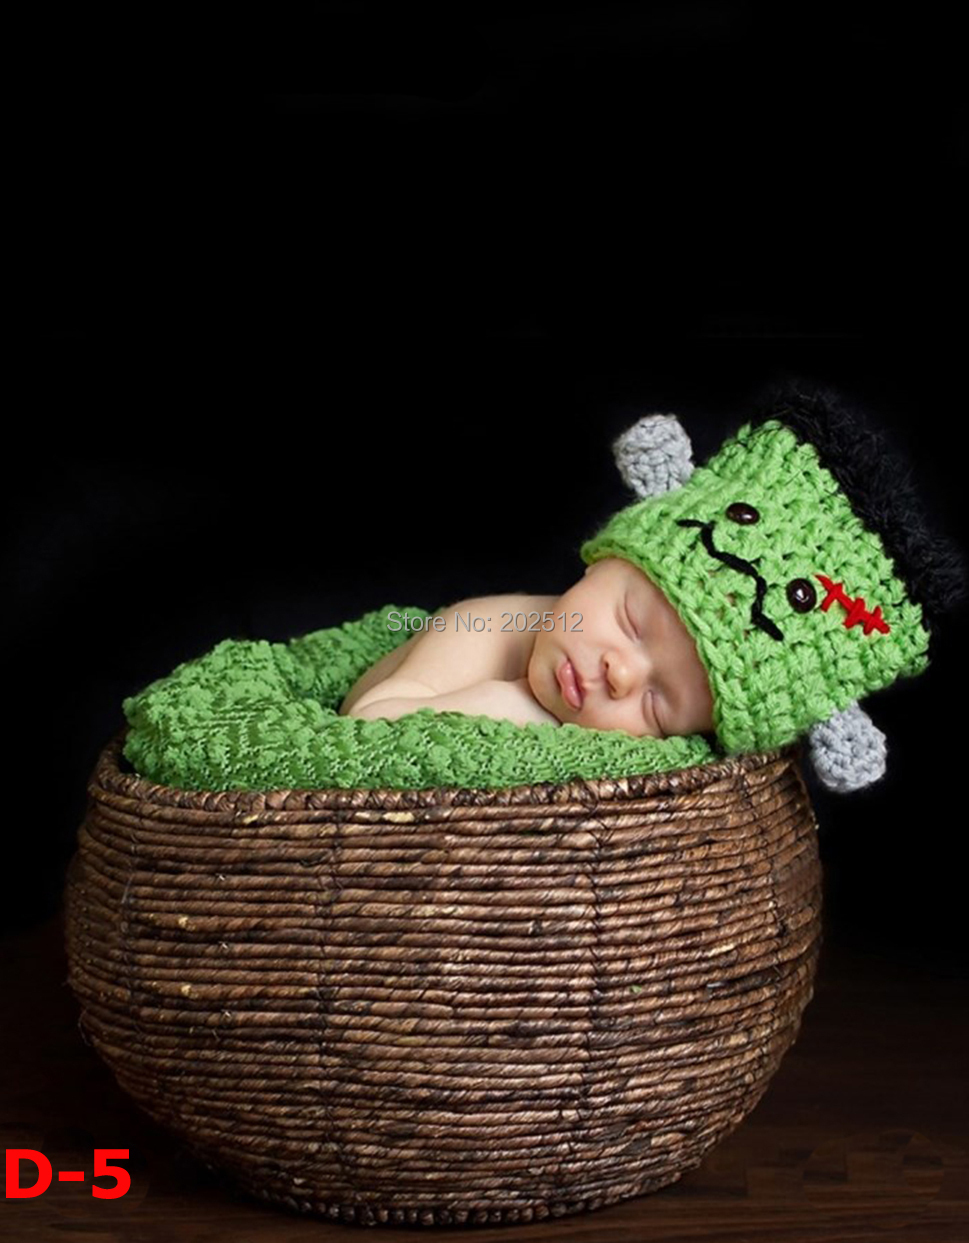 Newborn Babies Studio's New Baskets Photography Studio Props Photo Shoot Box for Baby Photographer D-5(China (Mainland))